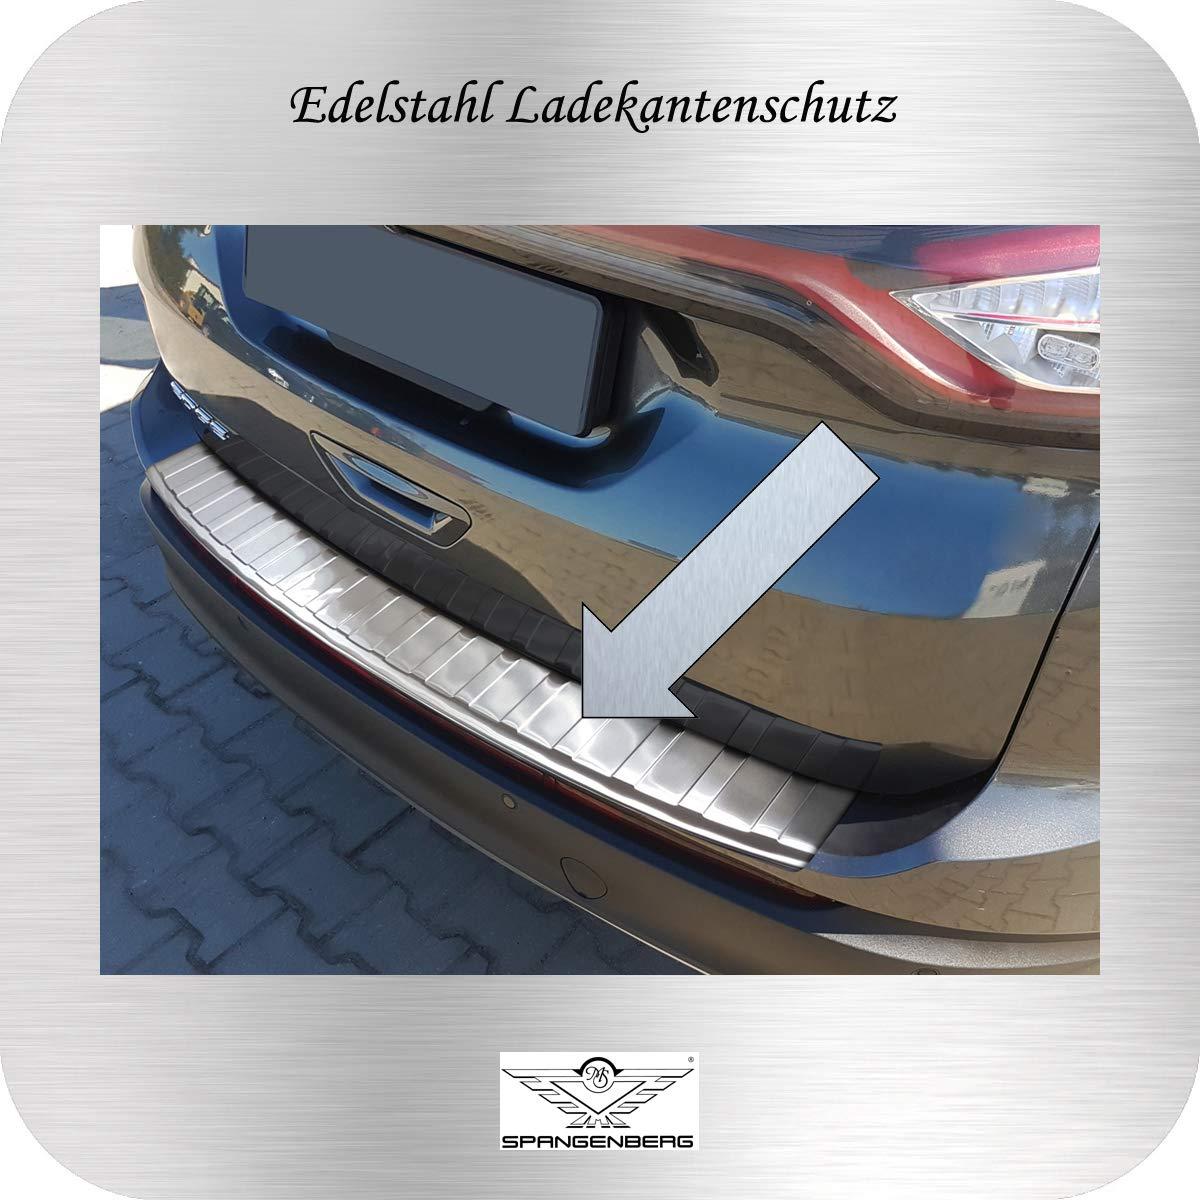 3235125 Generation vor Facelift 06.2016-07.2018 Art Spangenberg Edelstahl Ladekantenschutz f/ür Ford Edge II SUV 2